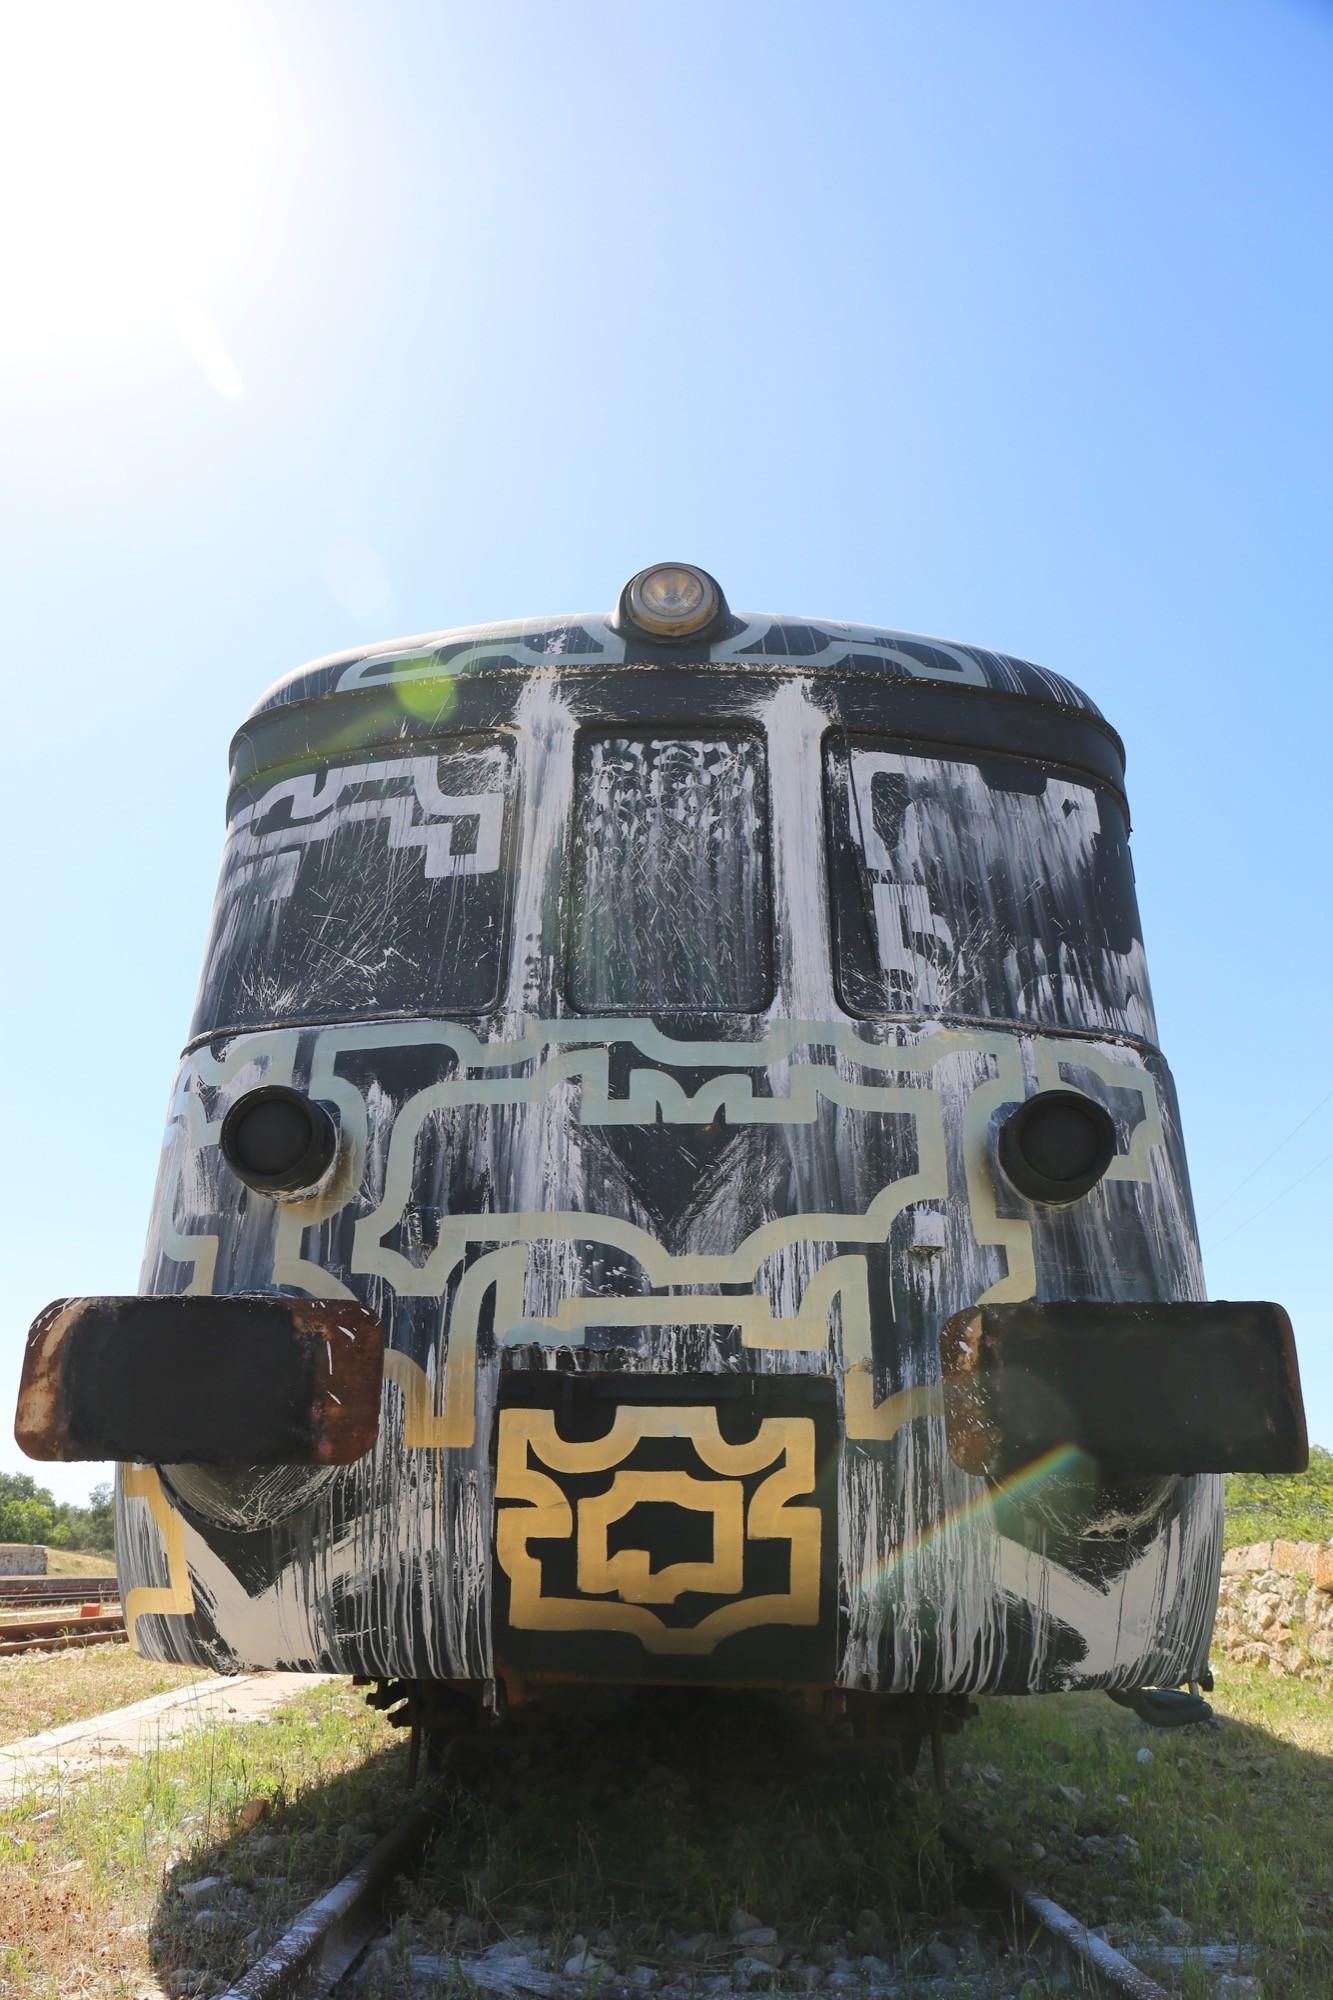 lek_Sowat_Streetcar-4